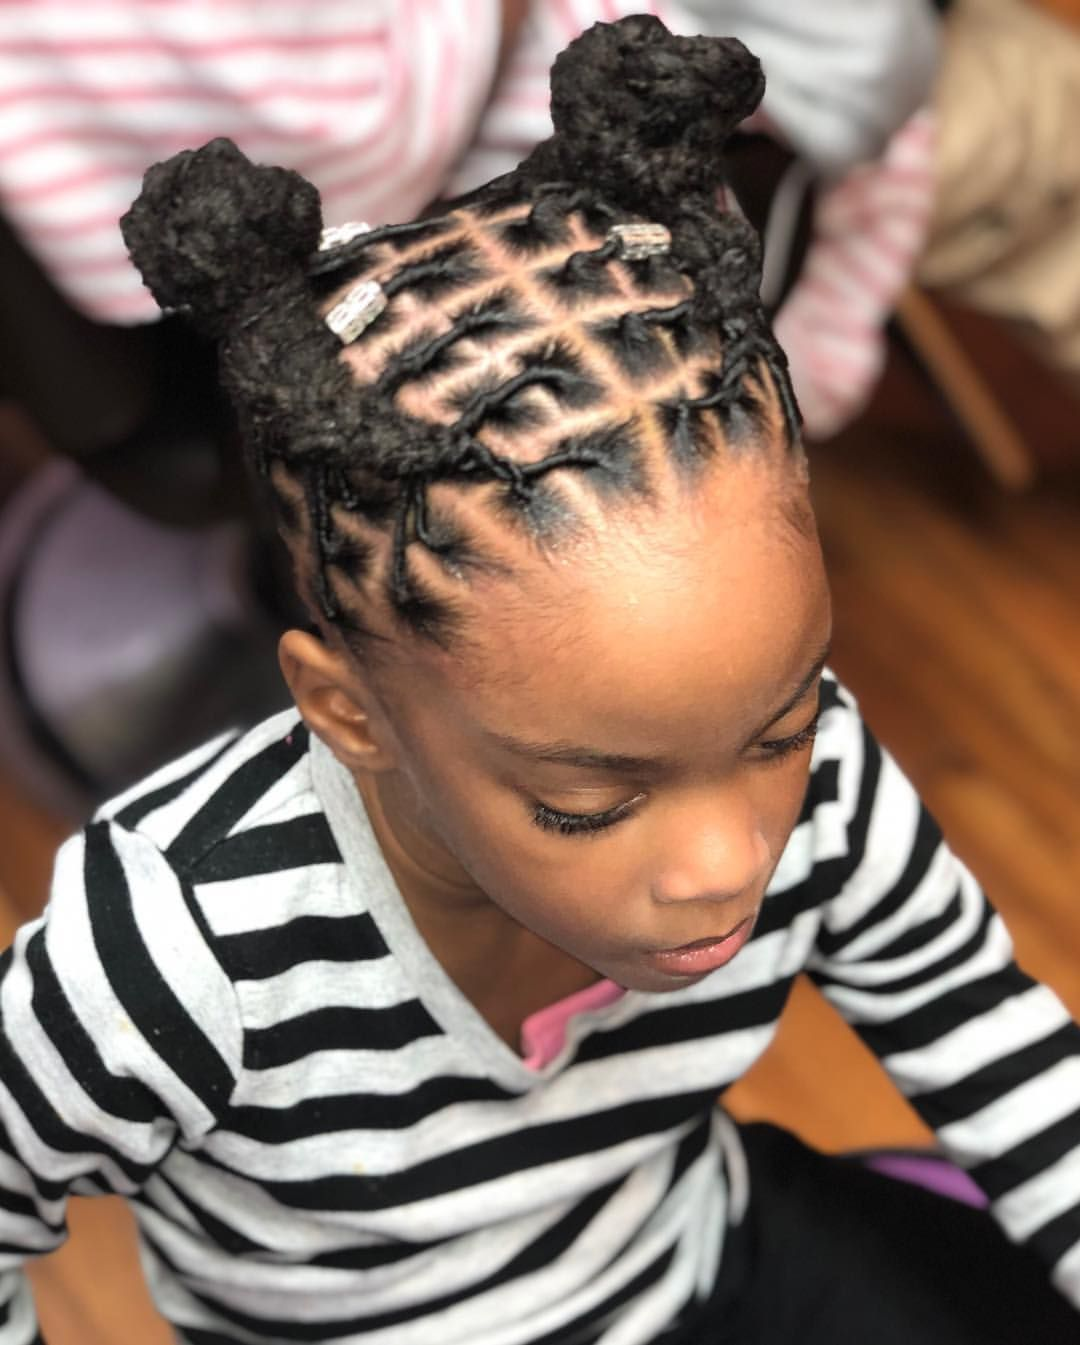 Stylist Thepookieleu Salon Sugardyme 704 493 5908 Loclife Locstyles Book Now For Holidays Like S Locs Hairstyles Dread Hairstyles Kids Hairstyles Girls